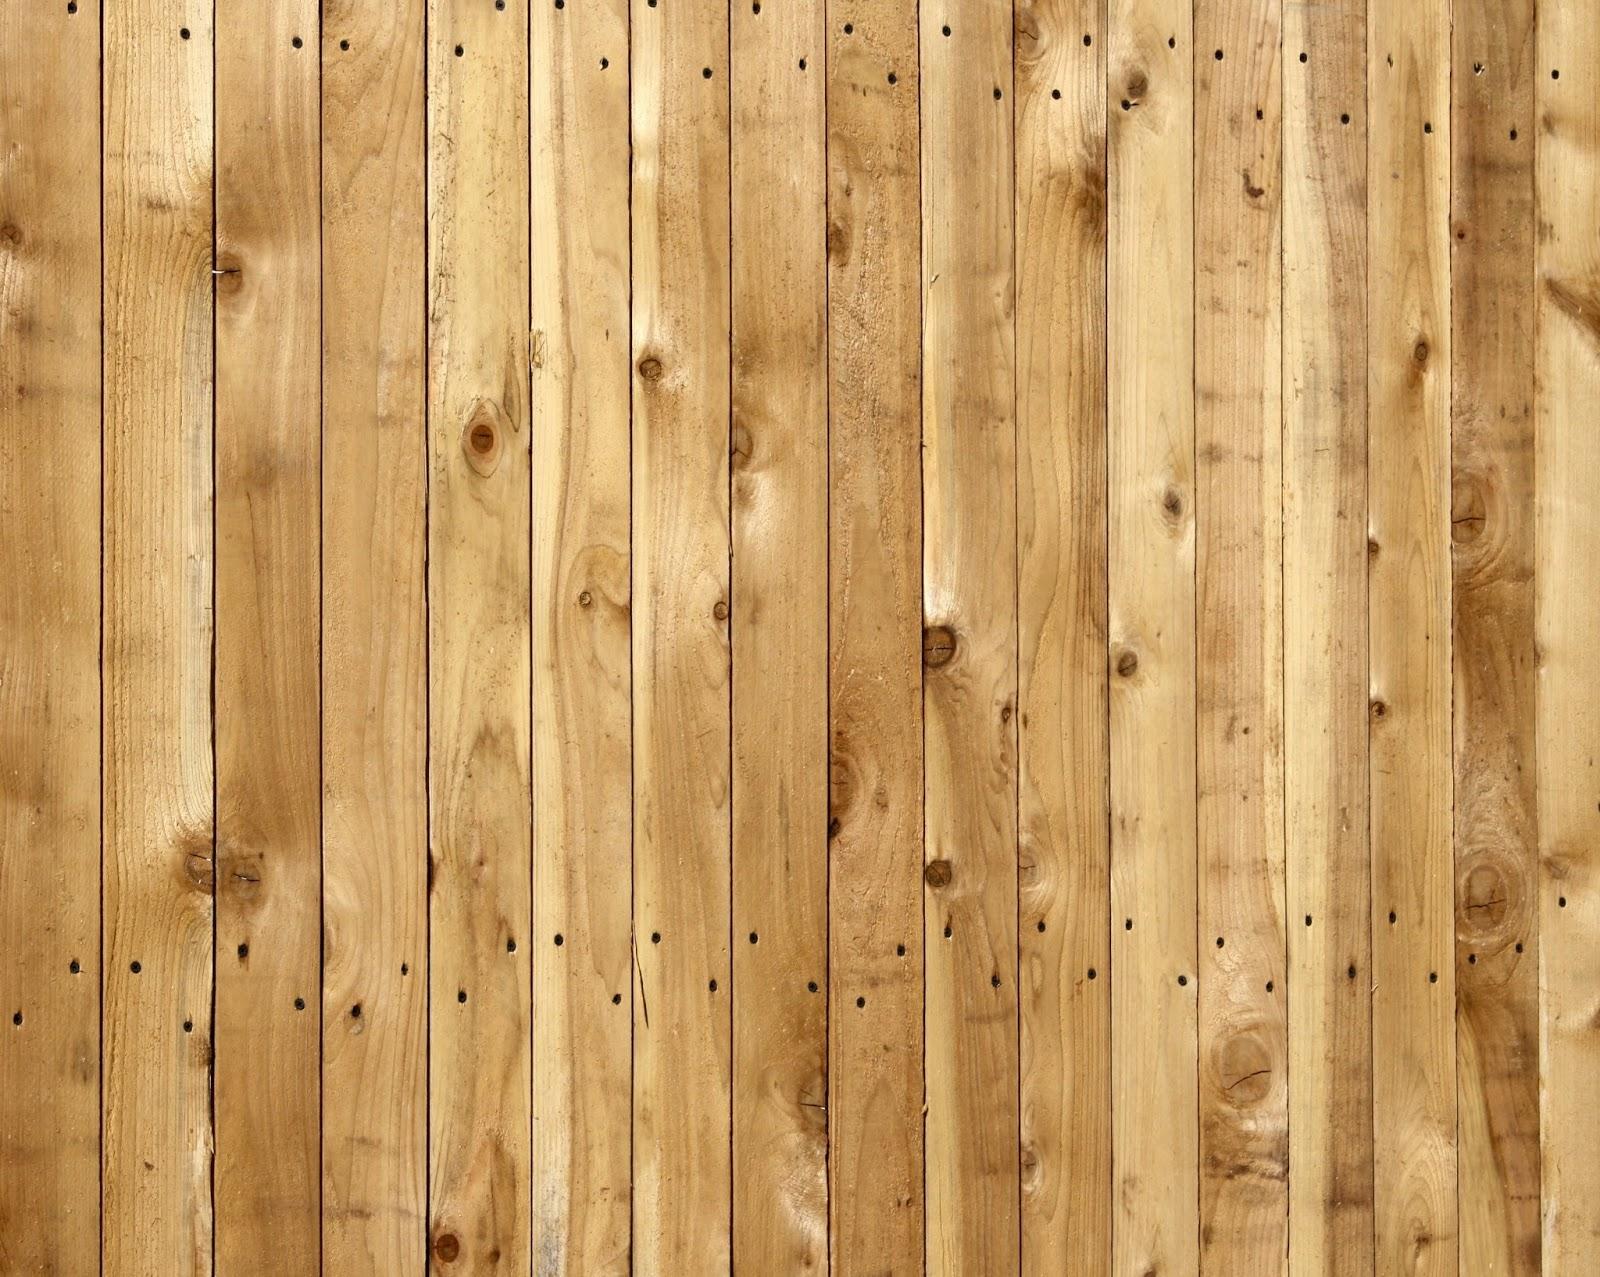 creative mindly fondos de madera para tus dise os o lo que sea. Black Bedroom Furniture Sets. Home Design Ideas